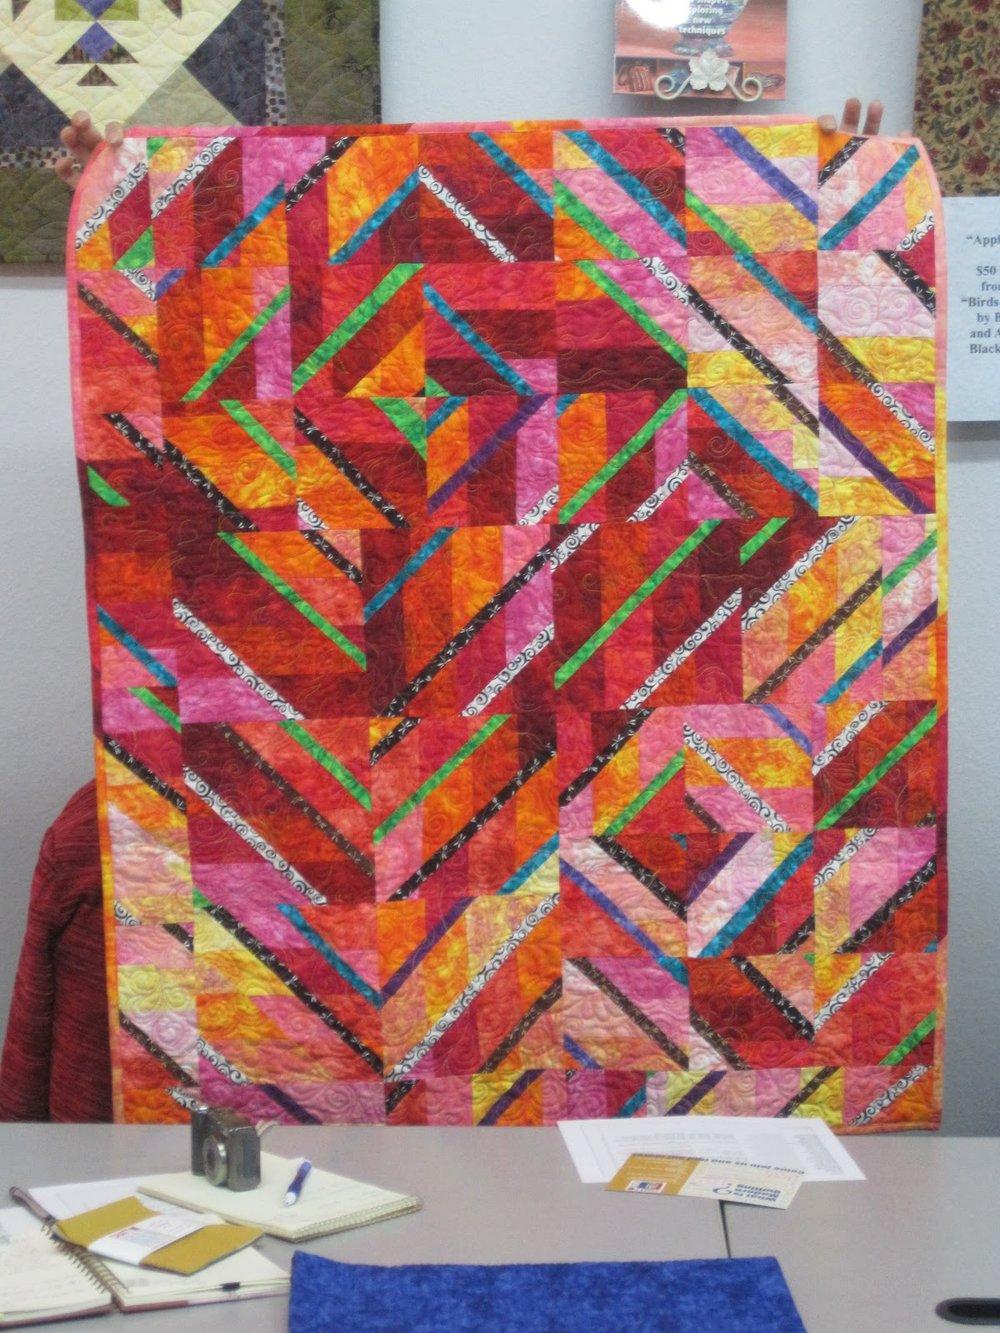 Quilt by Veronica Hofman-Ortega